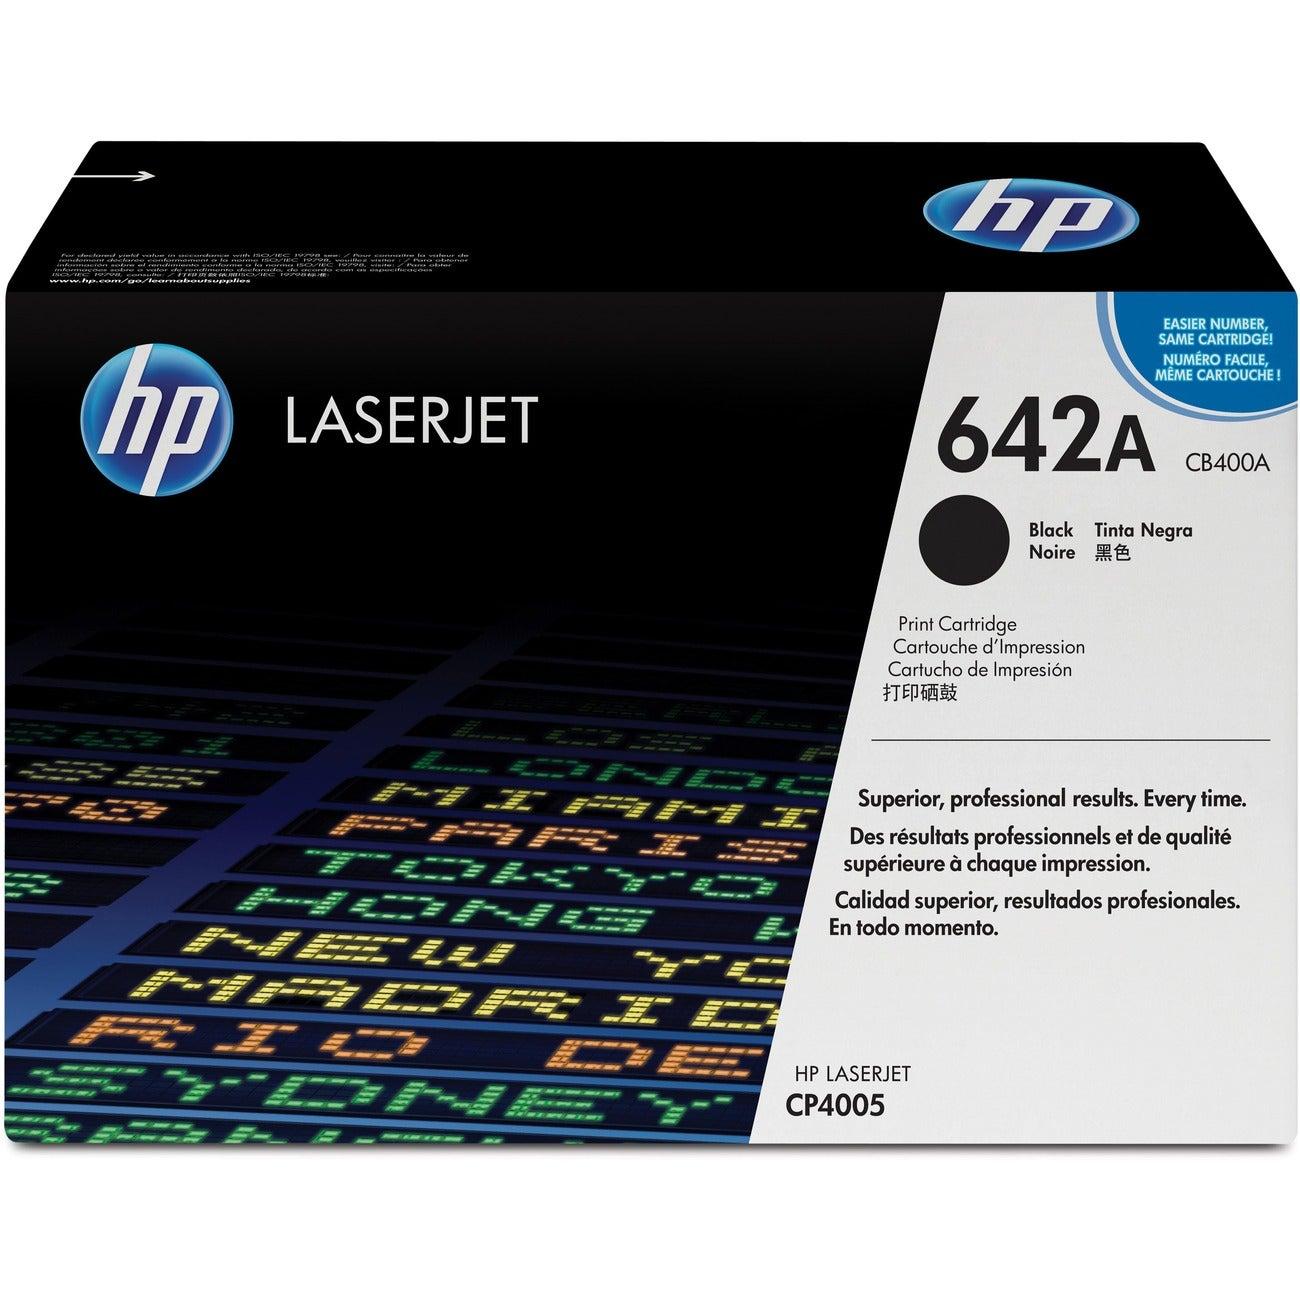 HP Black Toner Cartridge for LaserJet Color Printers